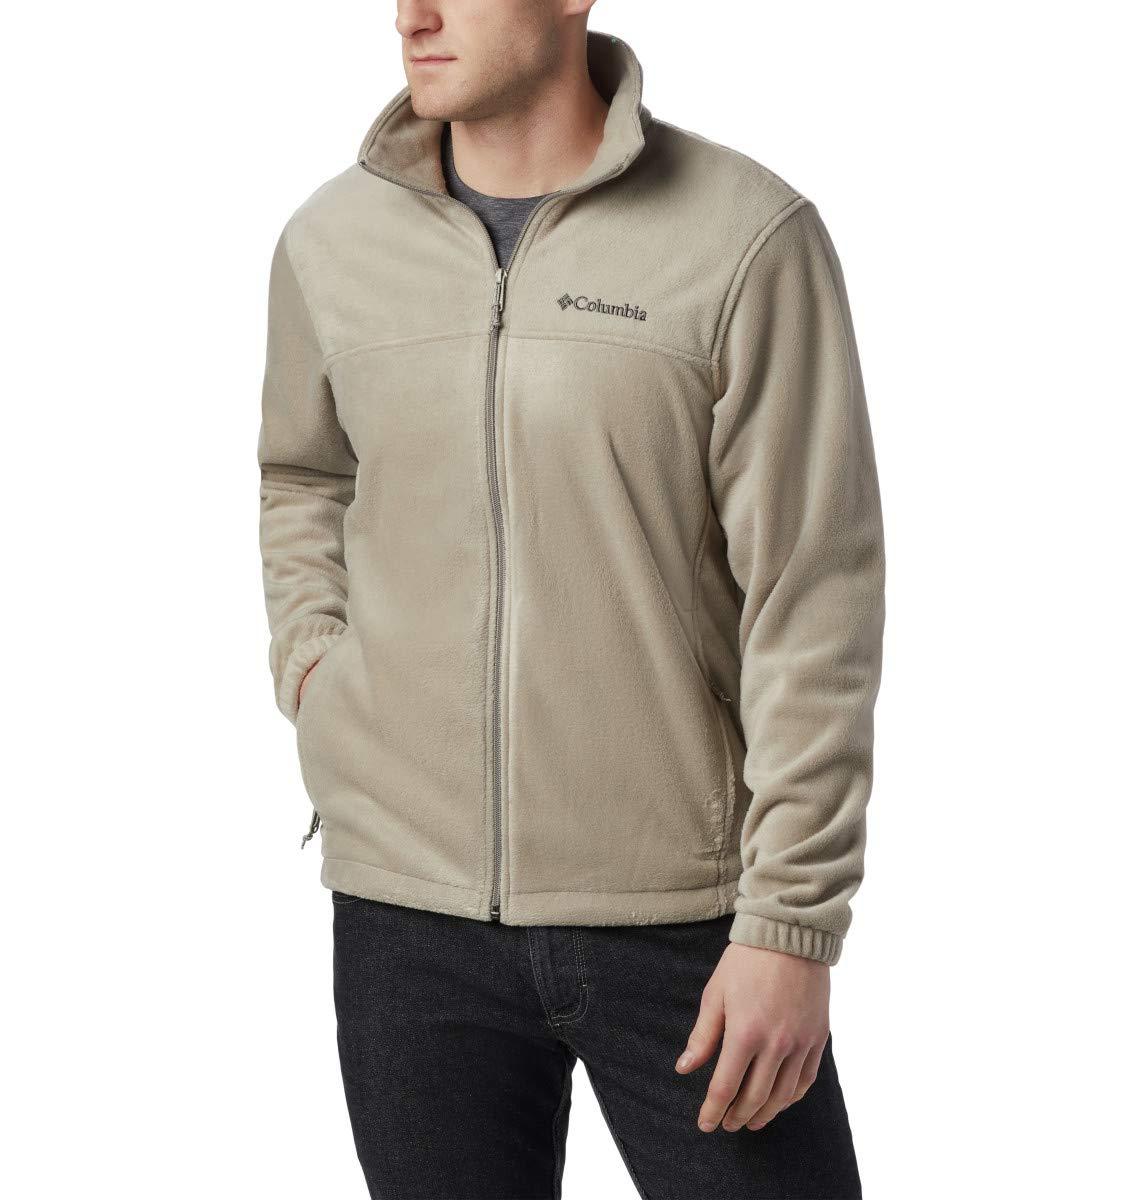 Columbia Men's Steens Mountain Full Zip Fleece 2.0 Jacket,Tusk,Large by Columbia